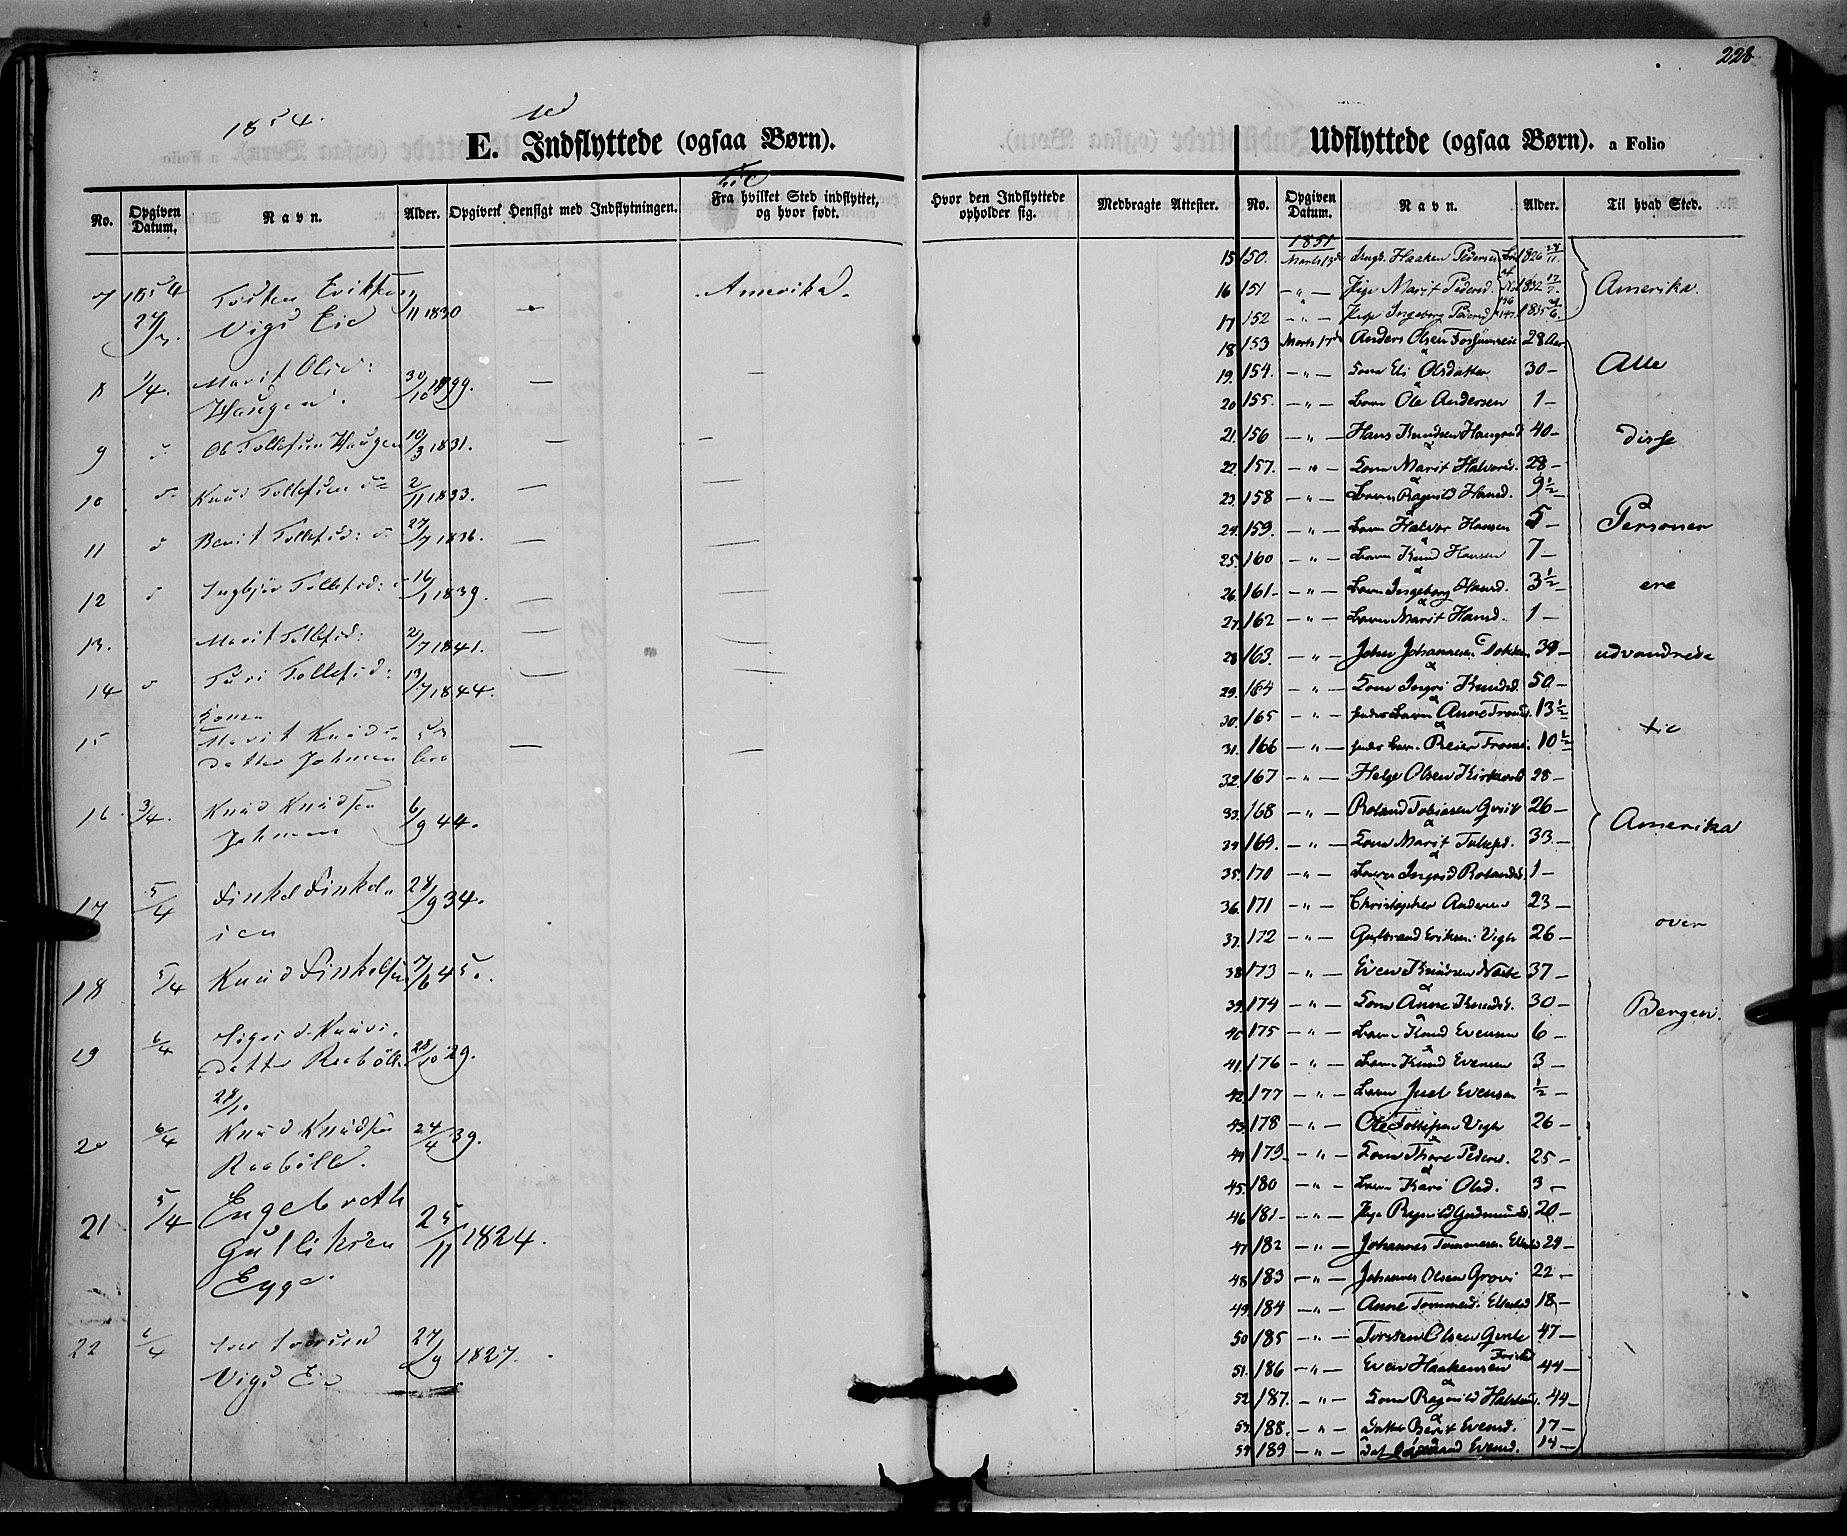 SAH, Vestre Slidre prestekontor, Ministerialbok nr. 1, 1844-1855, s. 228